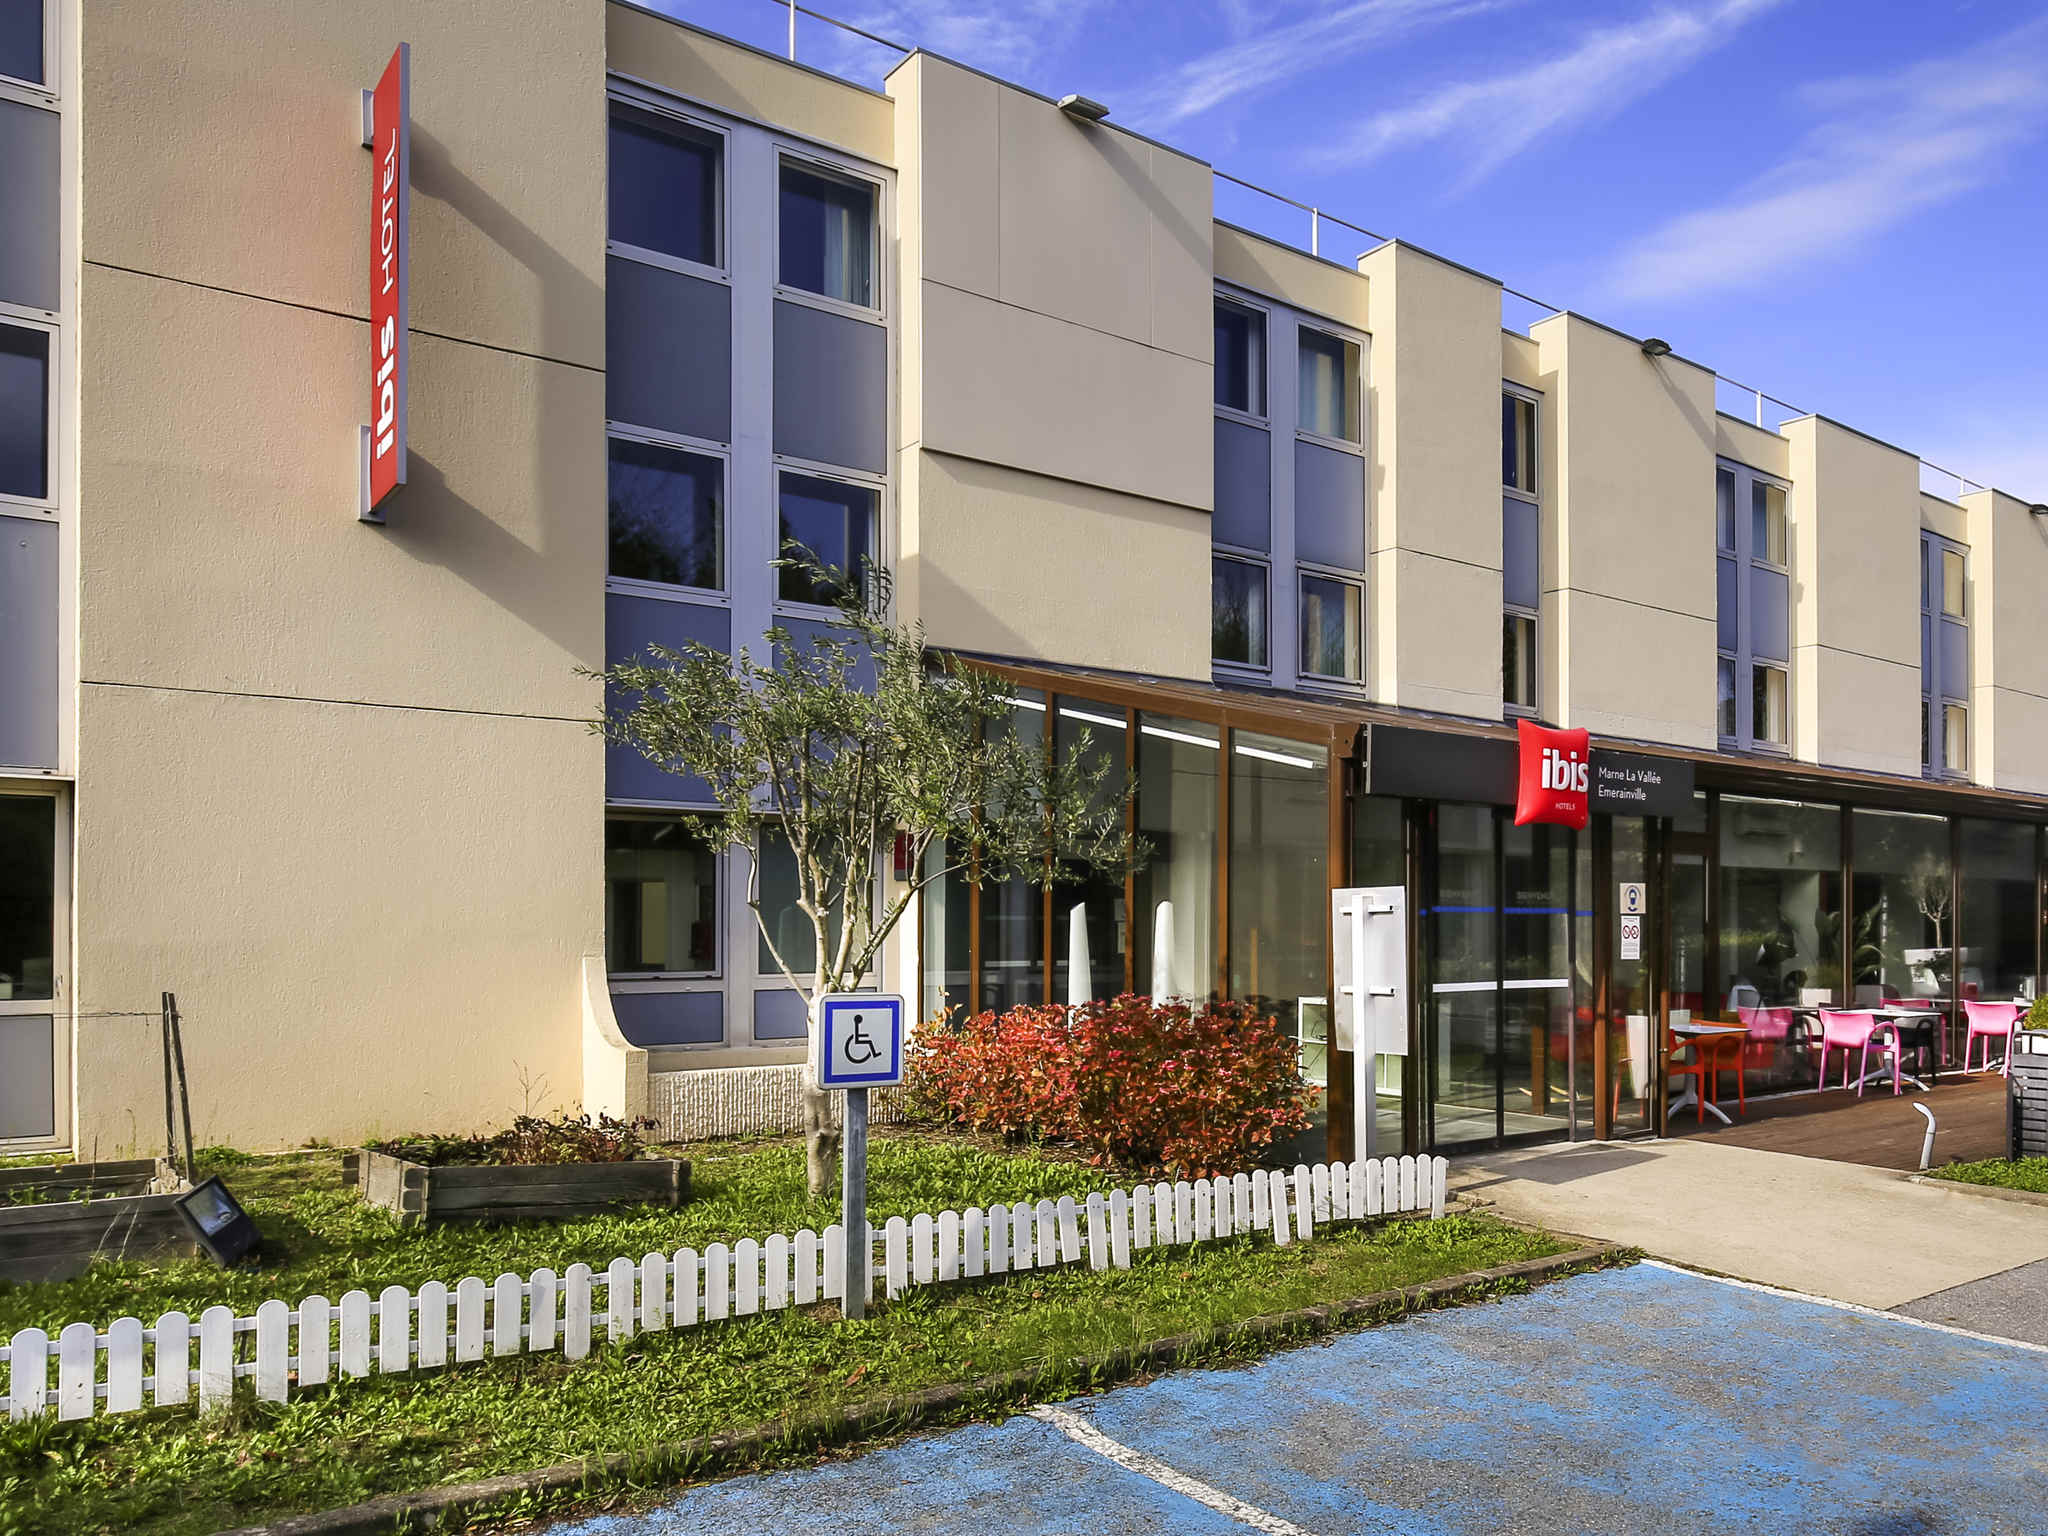 Hotel – ibis Marne la Vallee Emerainville